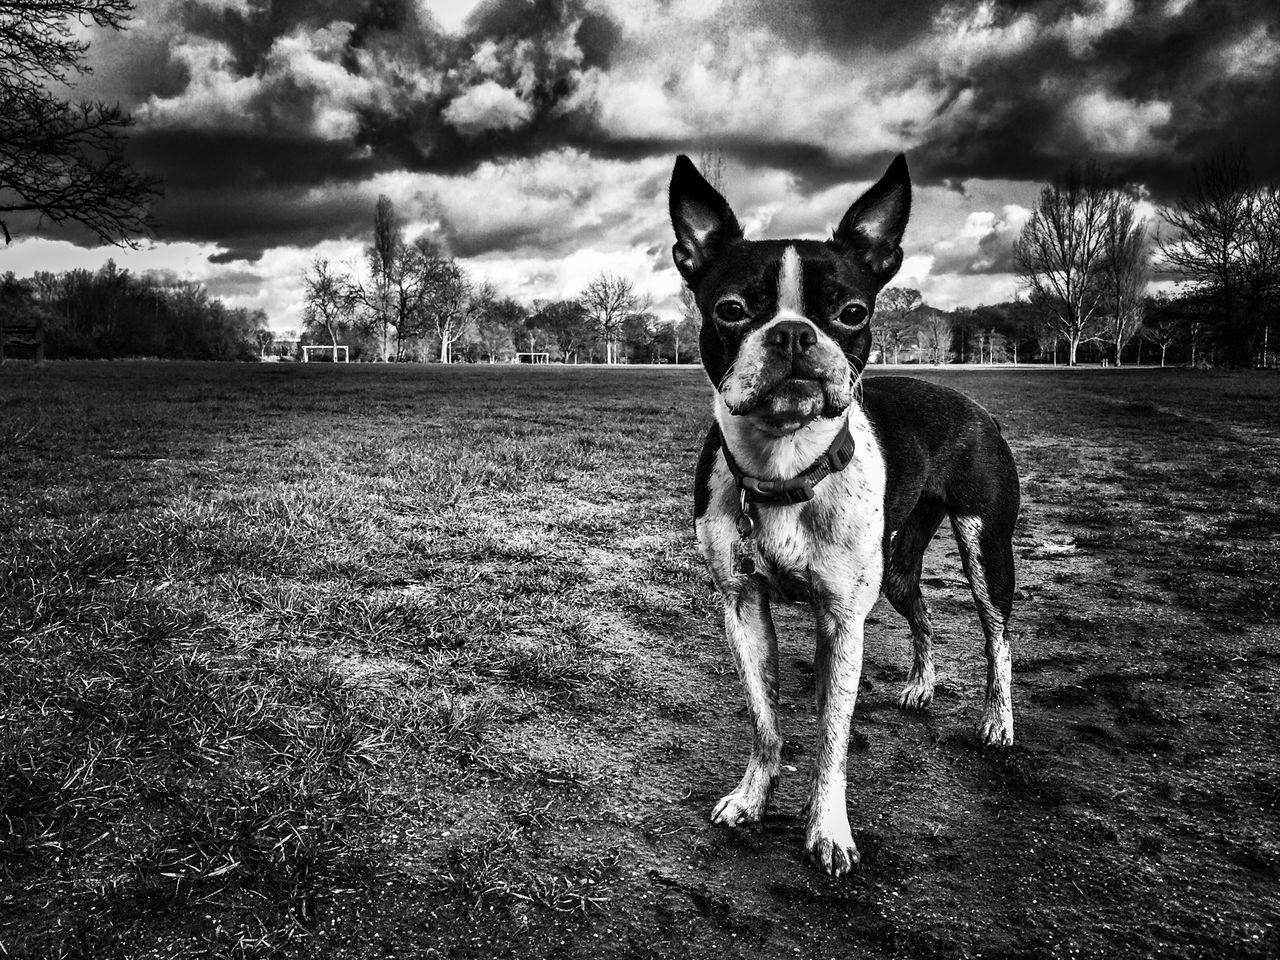 Portrait Of Boston Terrier On Field Against Cloudy Sky